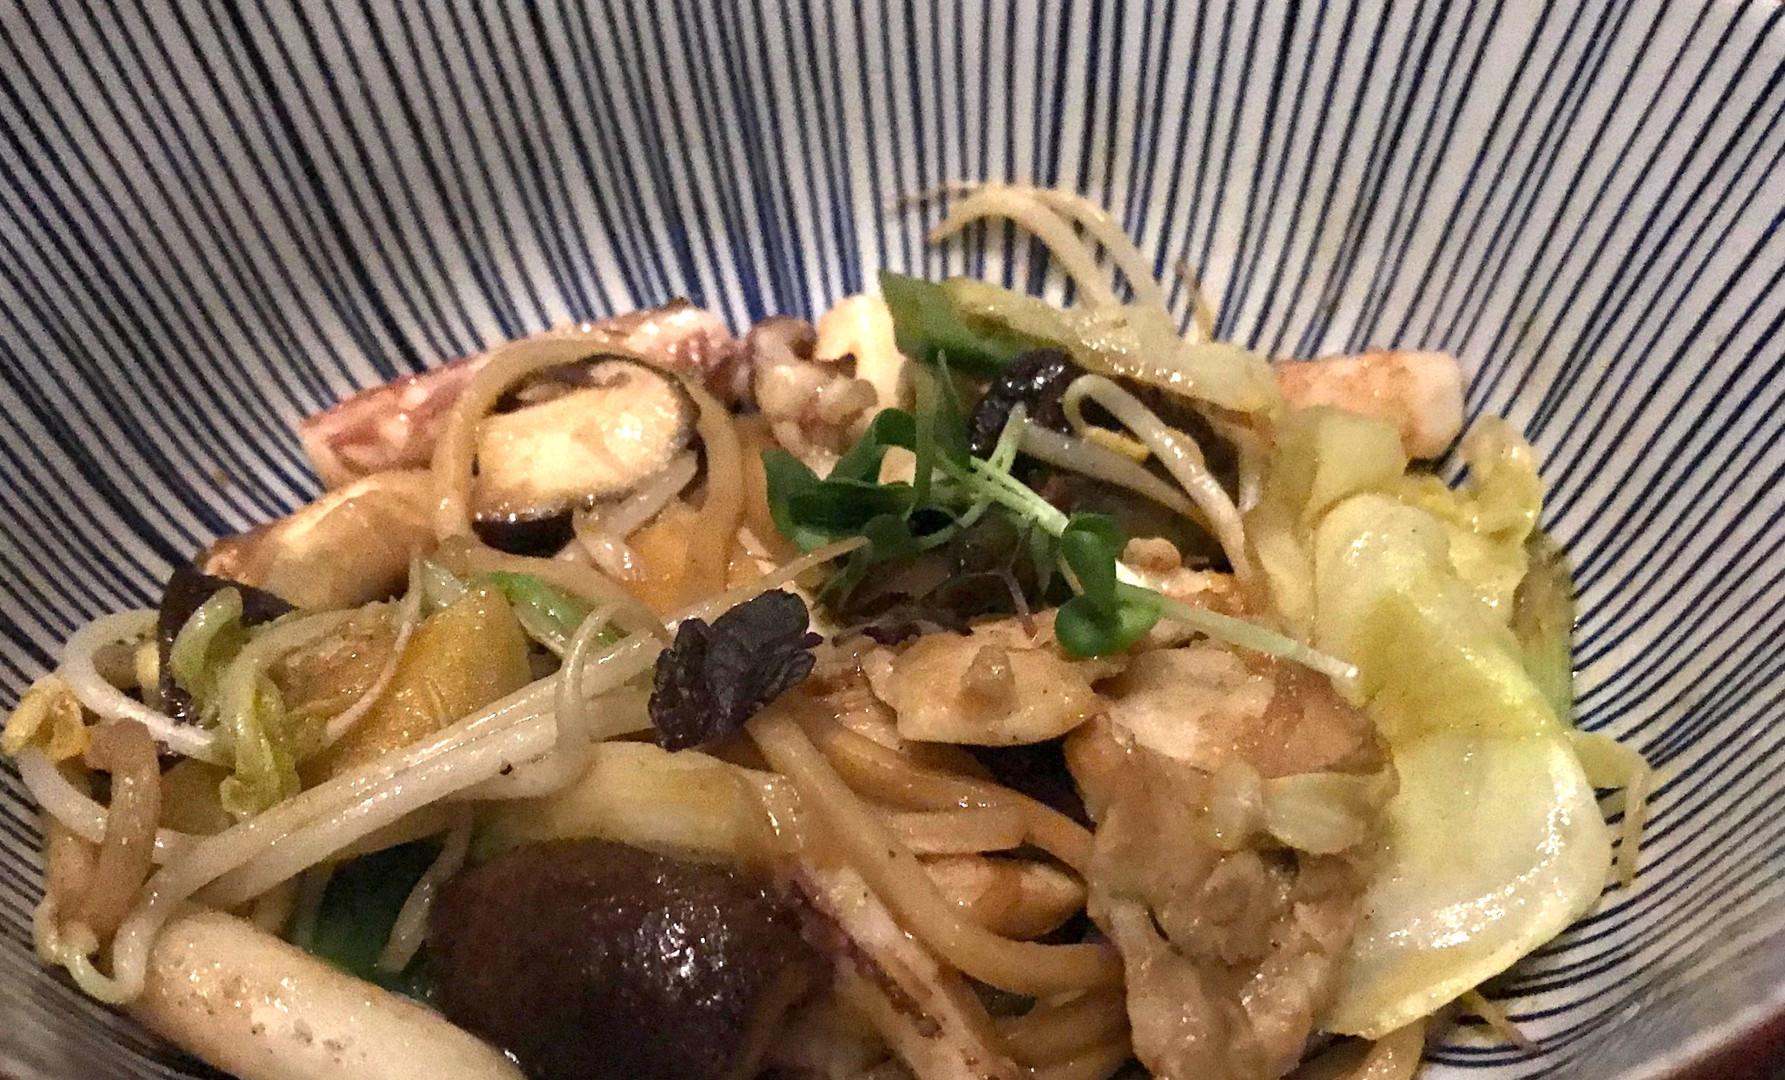 Yaki Soba - spaghetti freschi al salto con verdure, calamari e pesce bianco